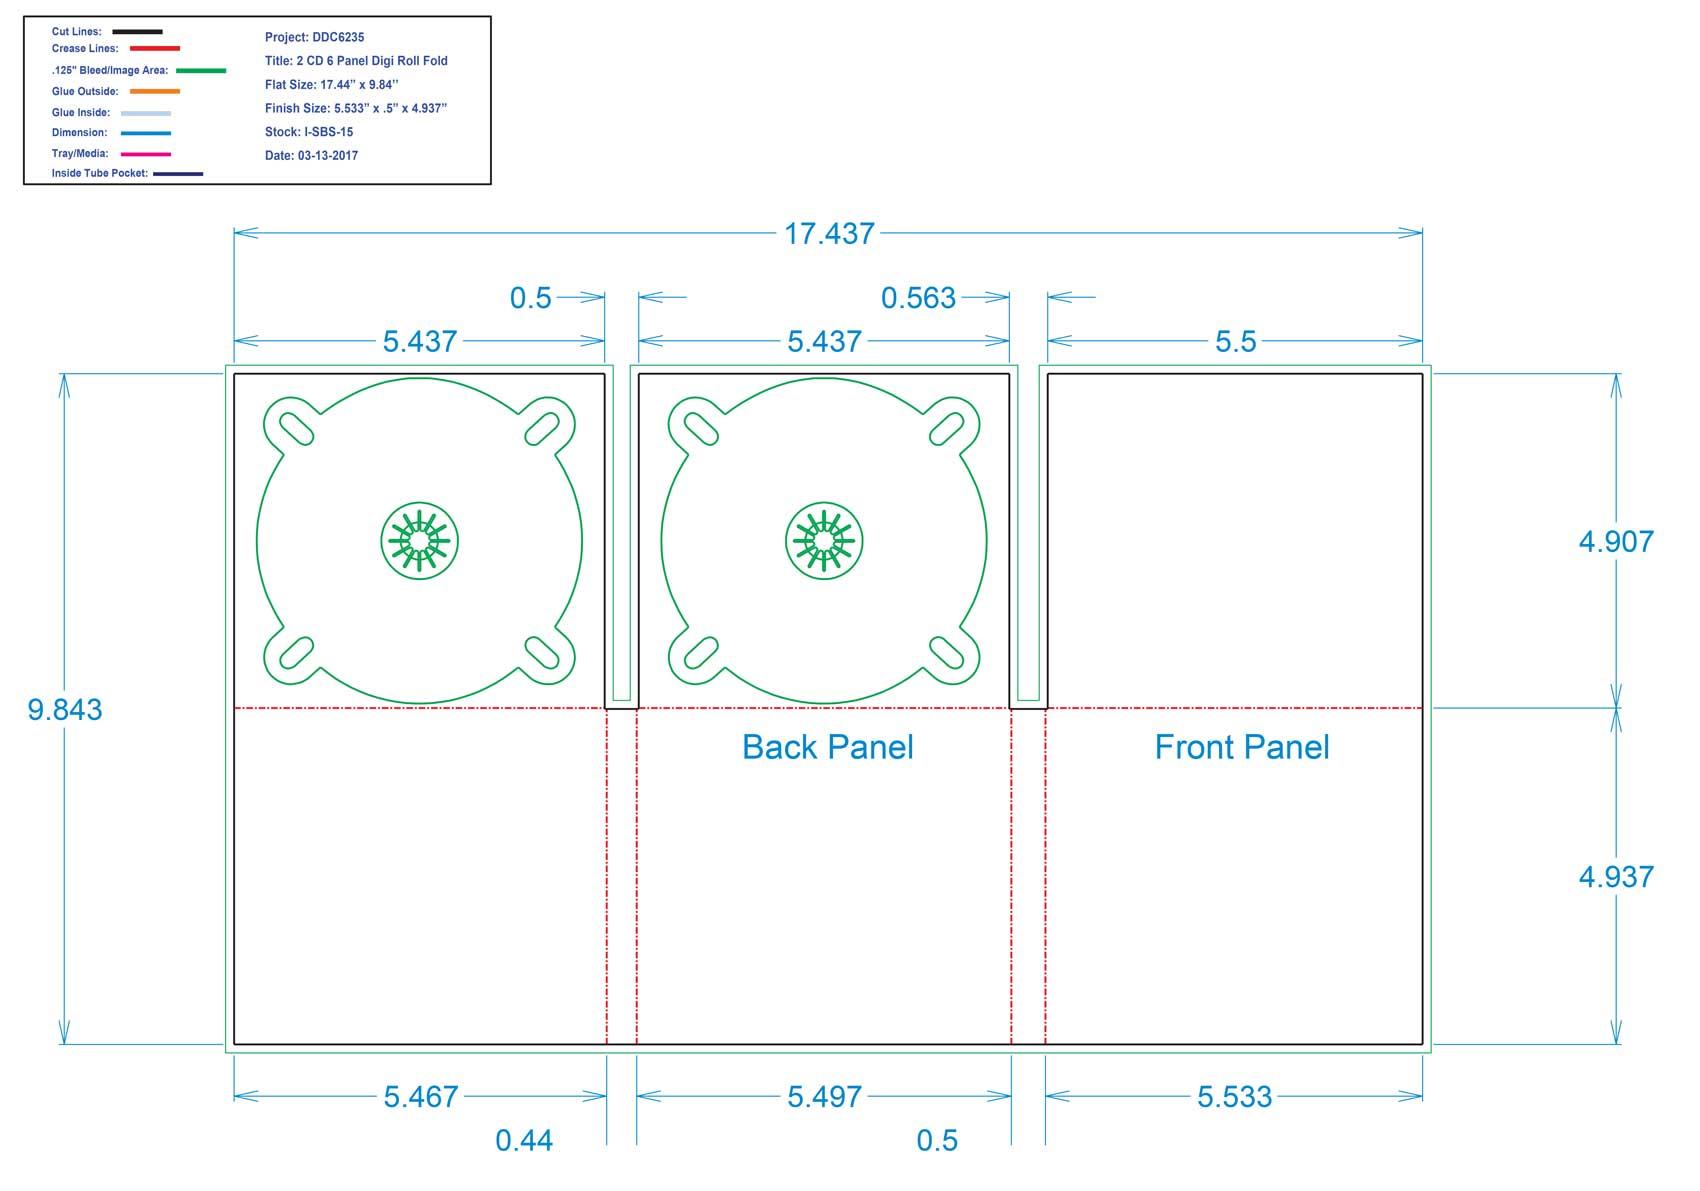 DDC6235 -2-CD 6-Panel Digi Roll Fold